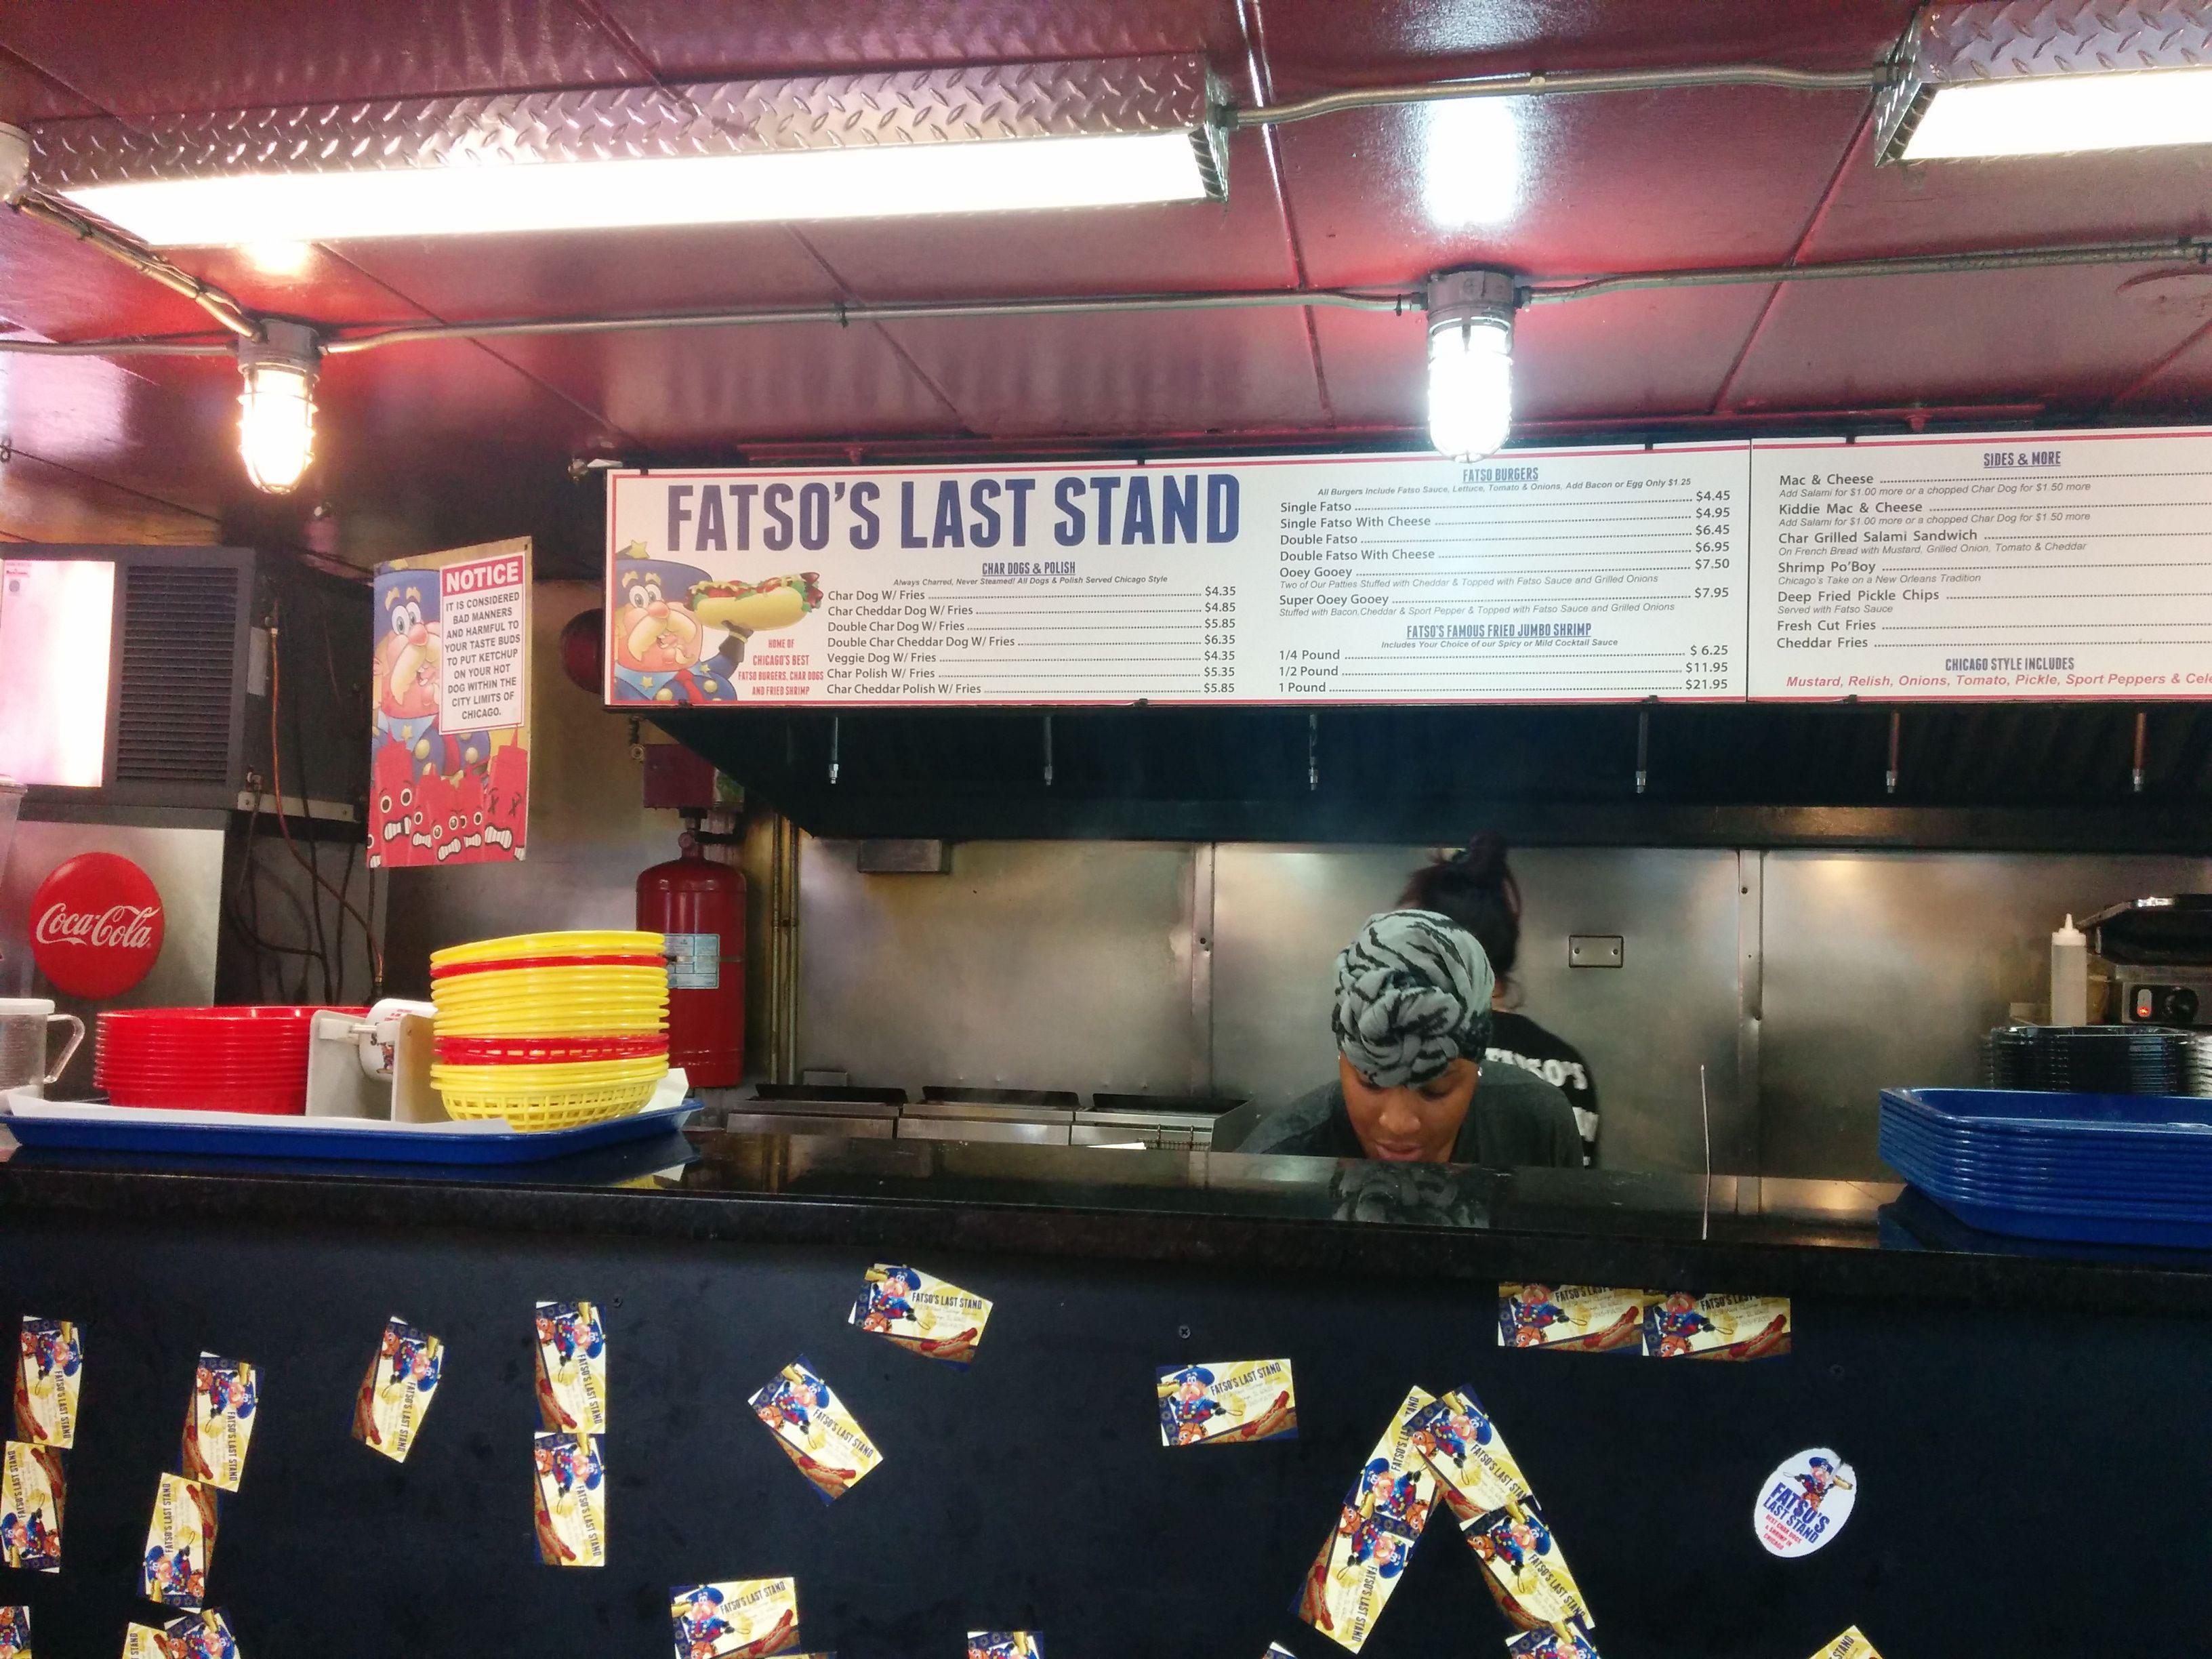 Fatso's last stand menu